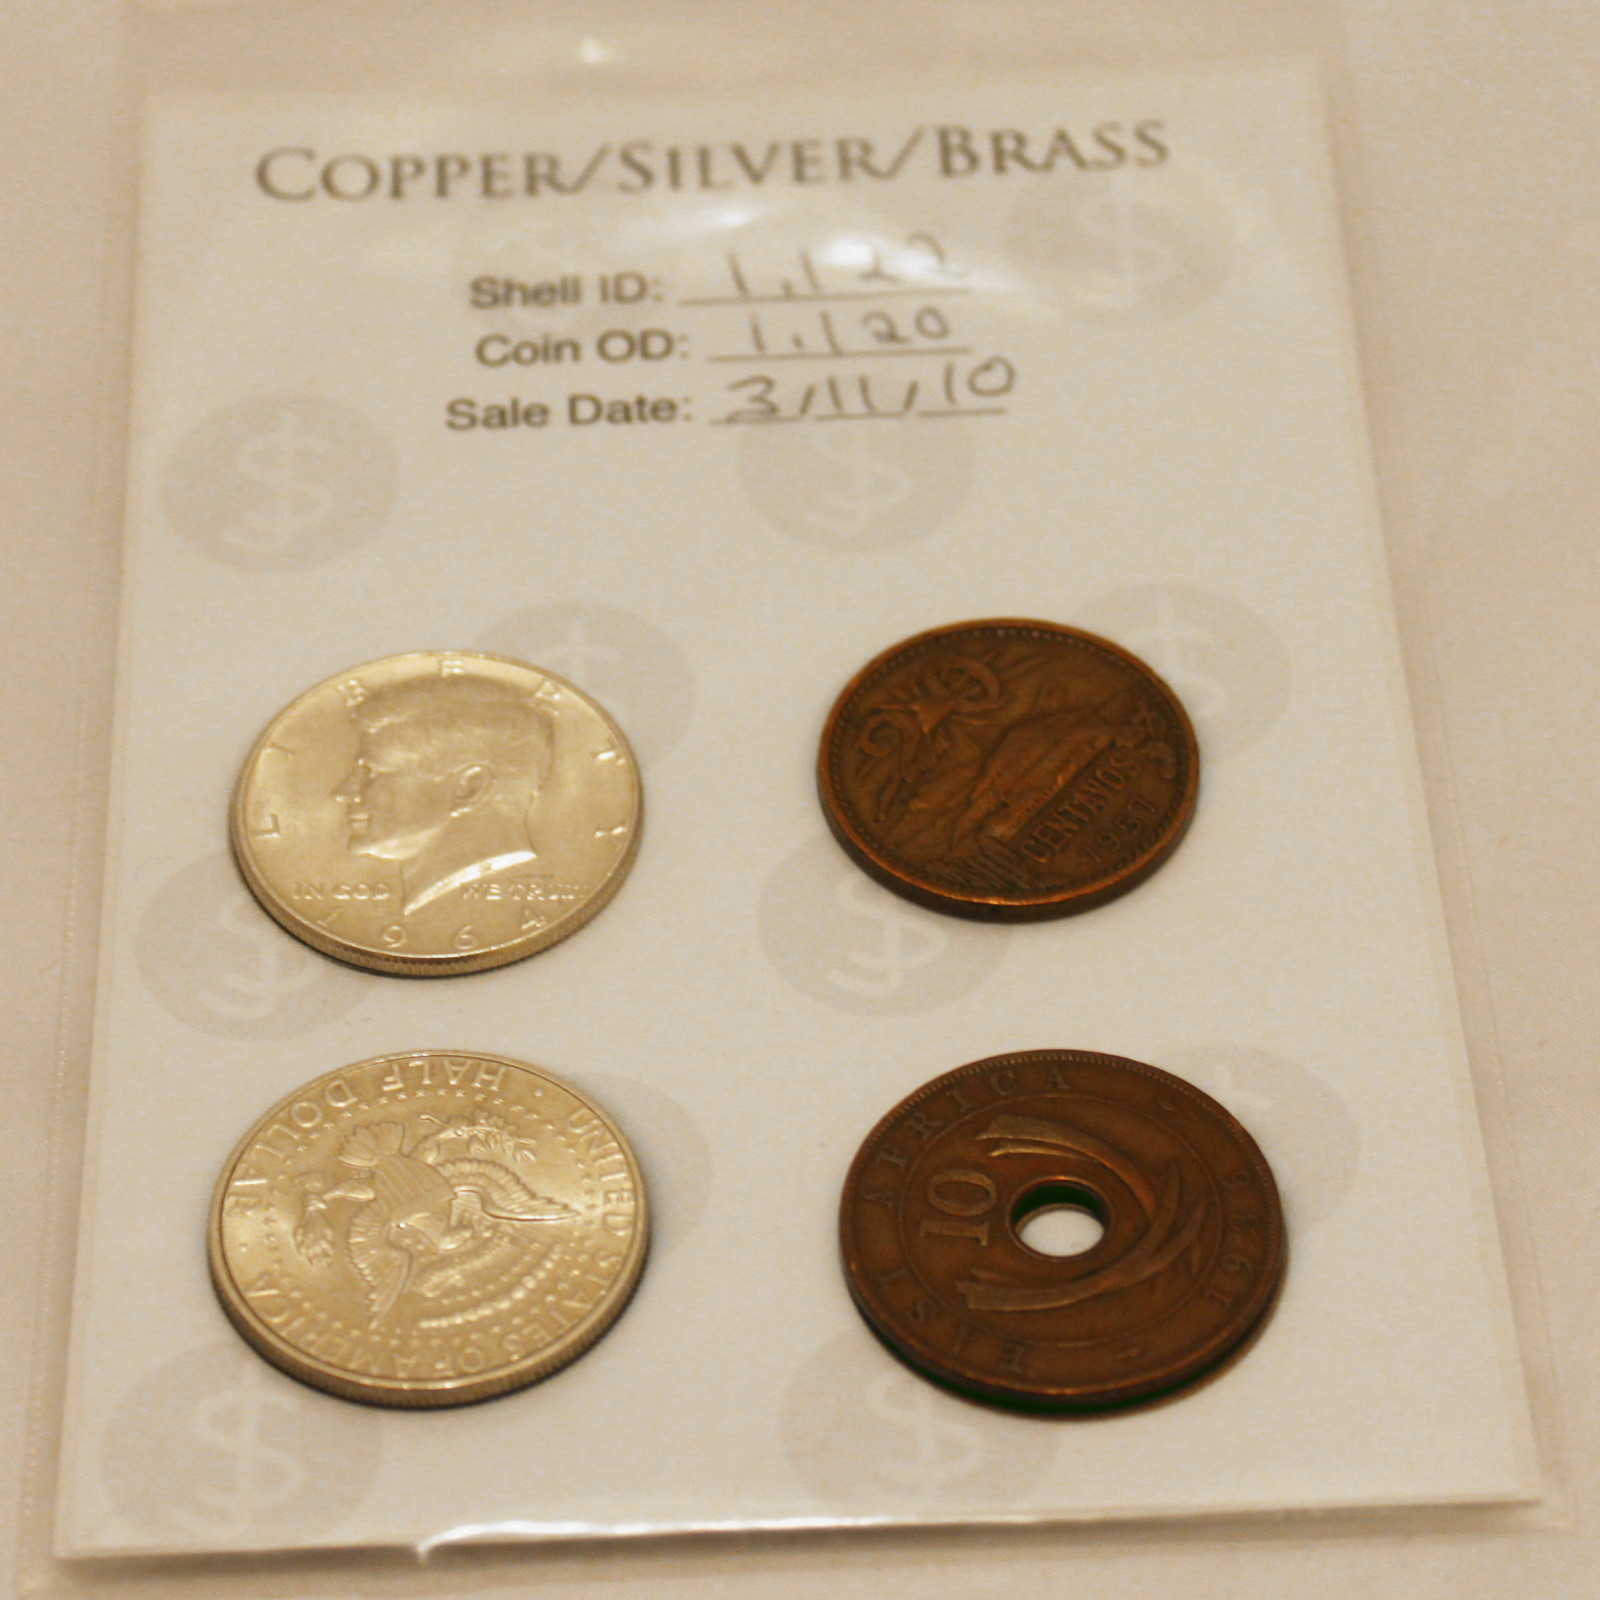 Copper, Sliver, Brass, Transpo 2 (Schoolcraft) by Jamie Schoolcraft